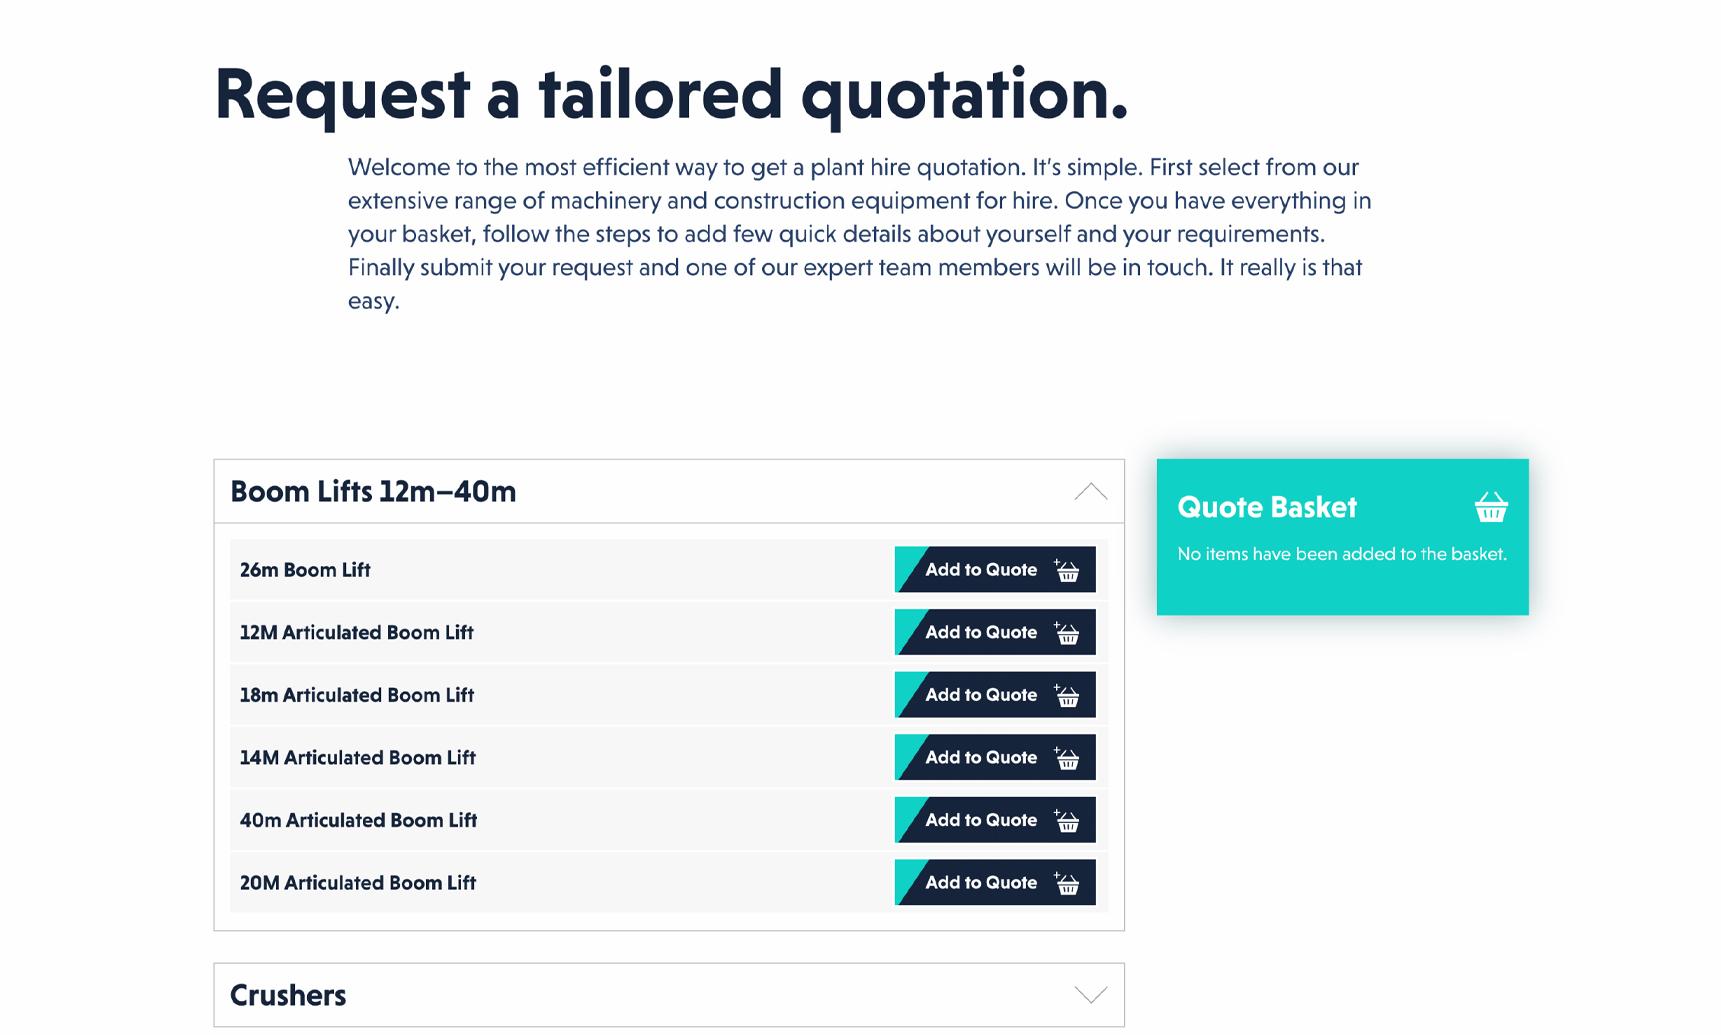 Design of quotation basket